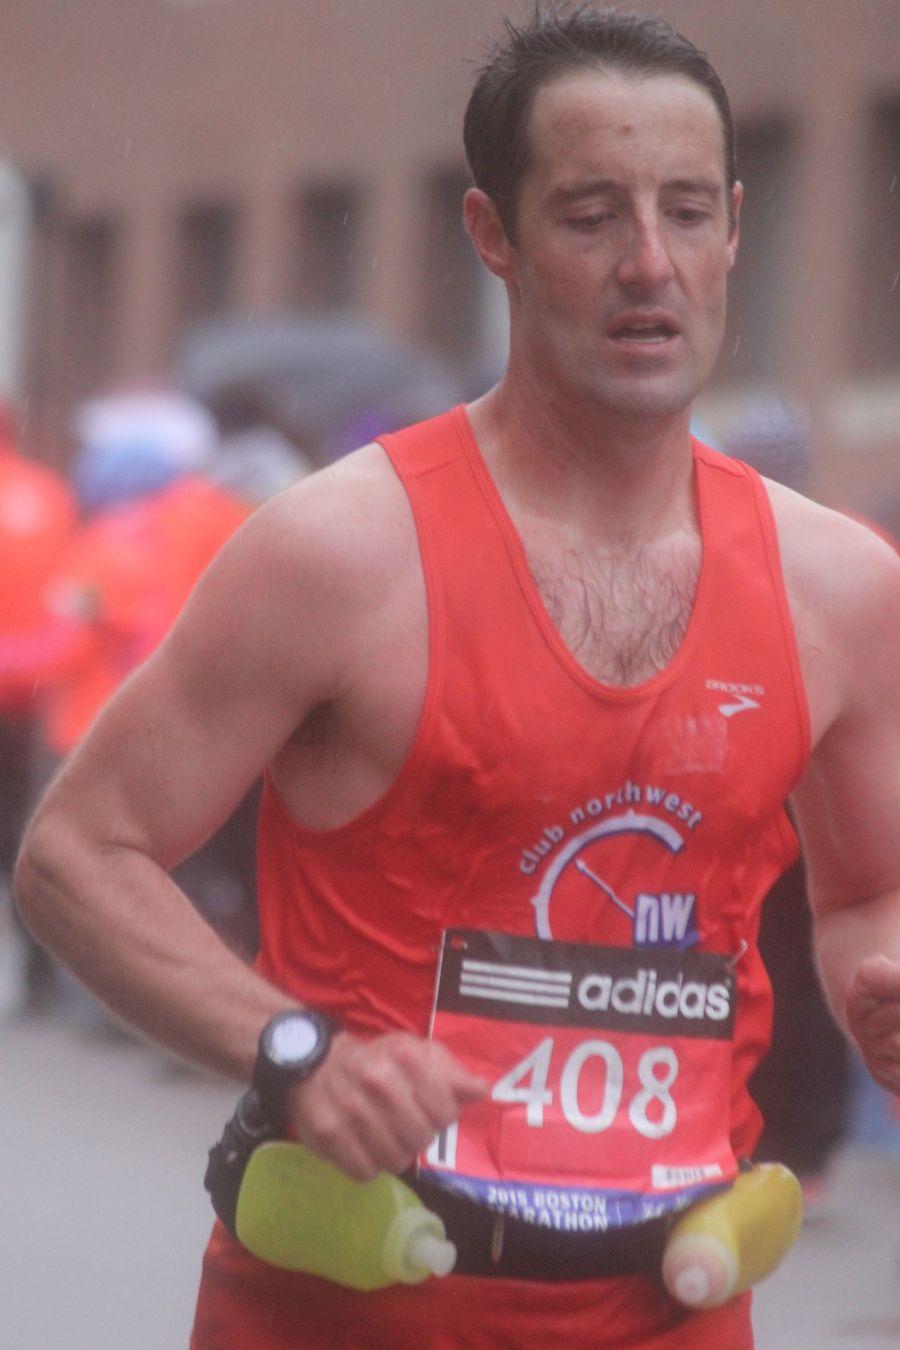 boston marathon april 20 2015 racer number 408